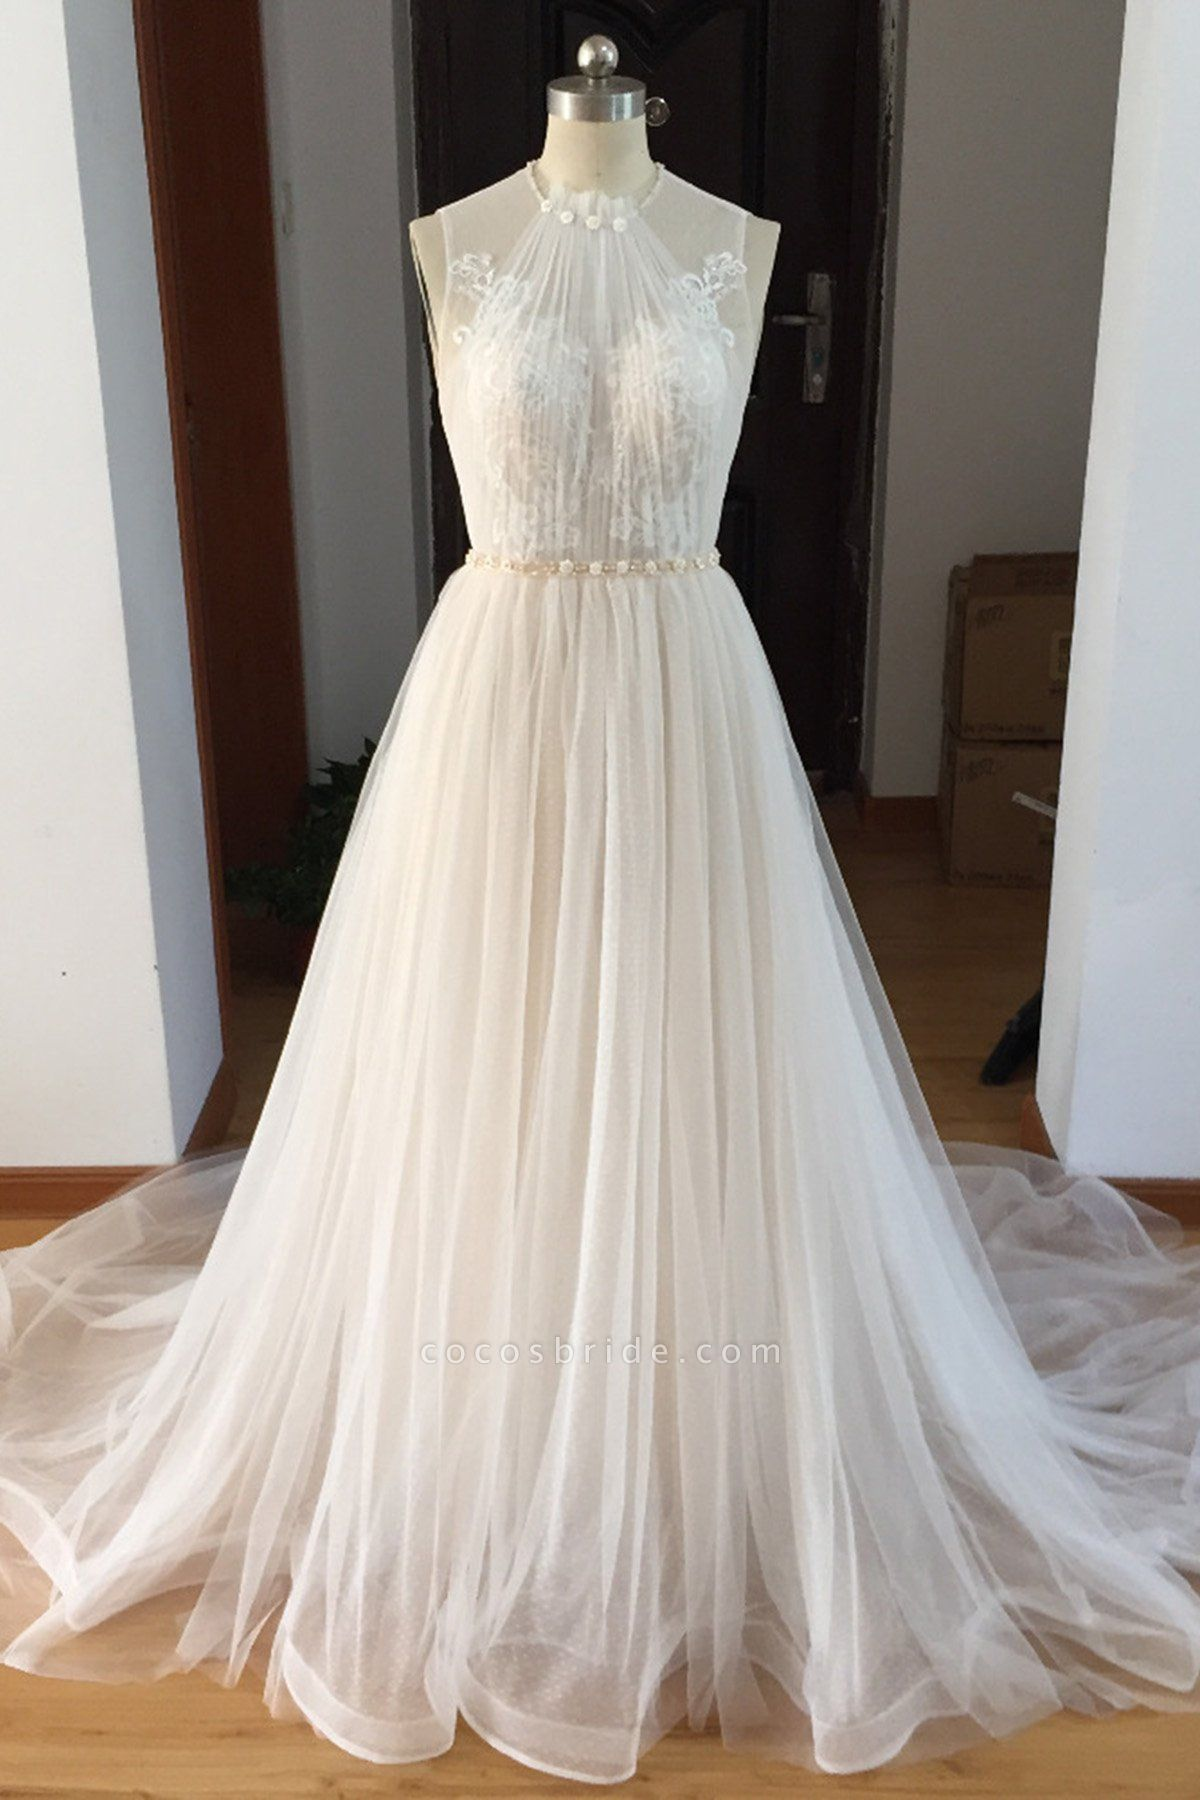 White Tulle Beaded Long Beaded Lace Wedding Dress